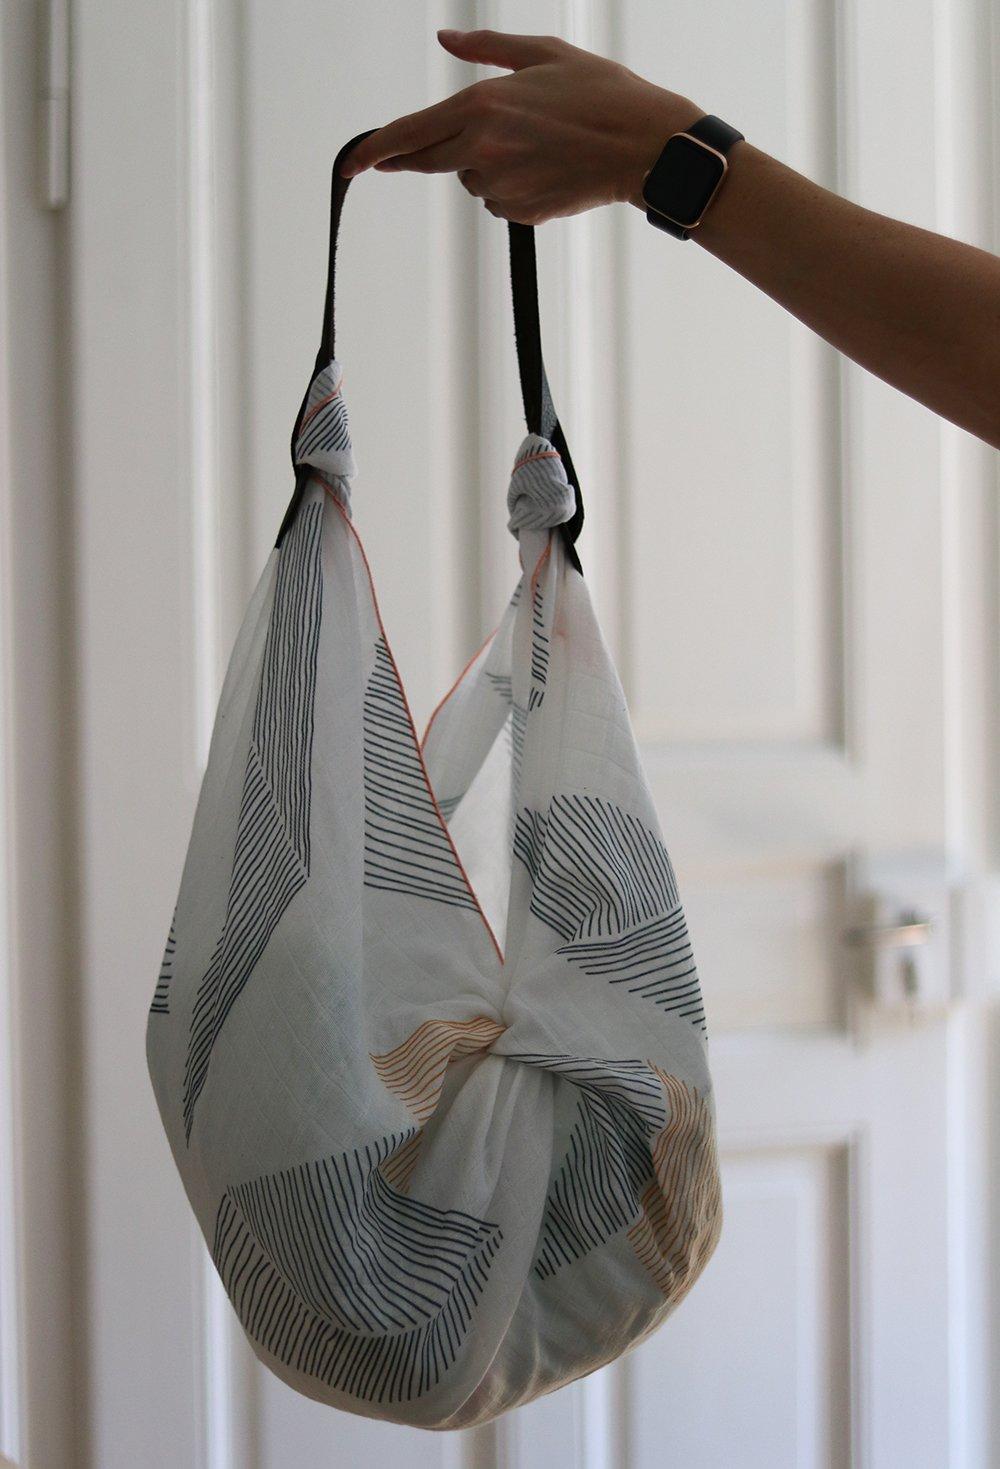 Furoshiki-Tuch als Tasche